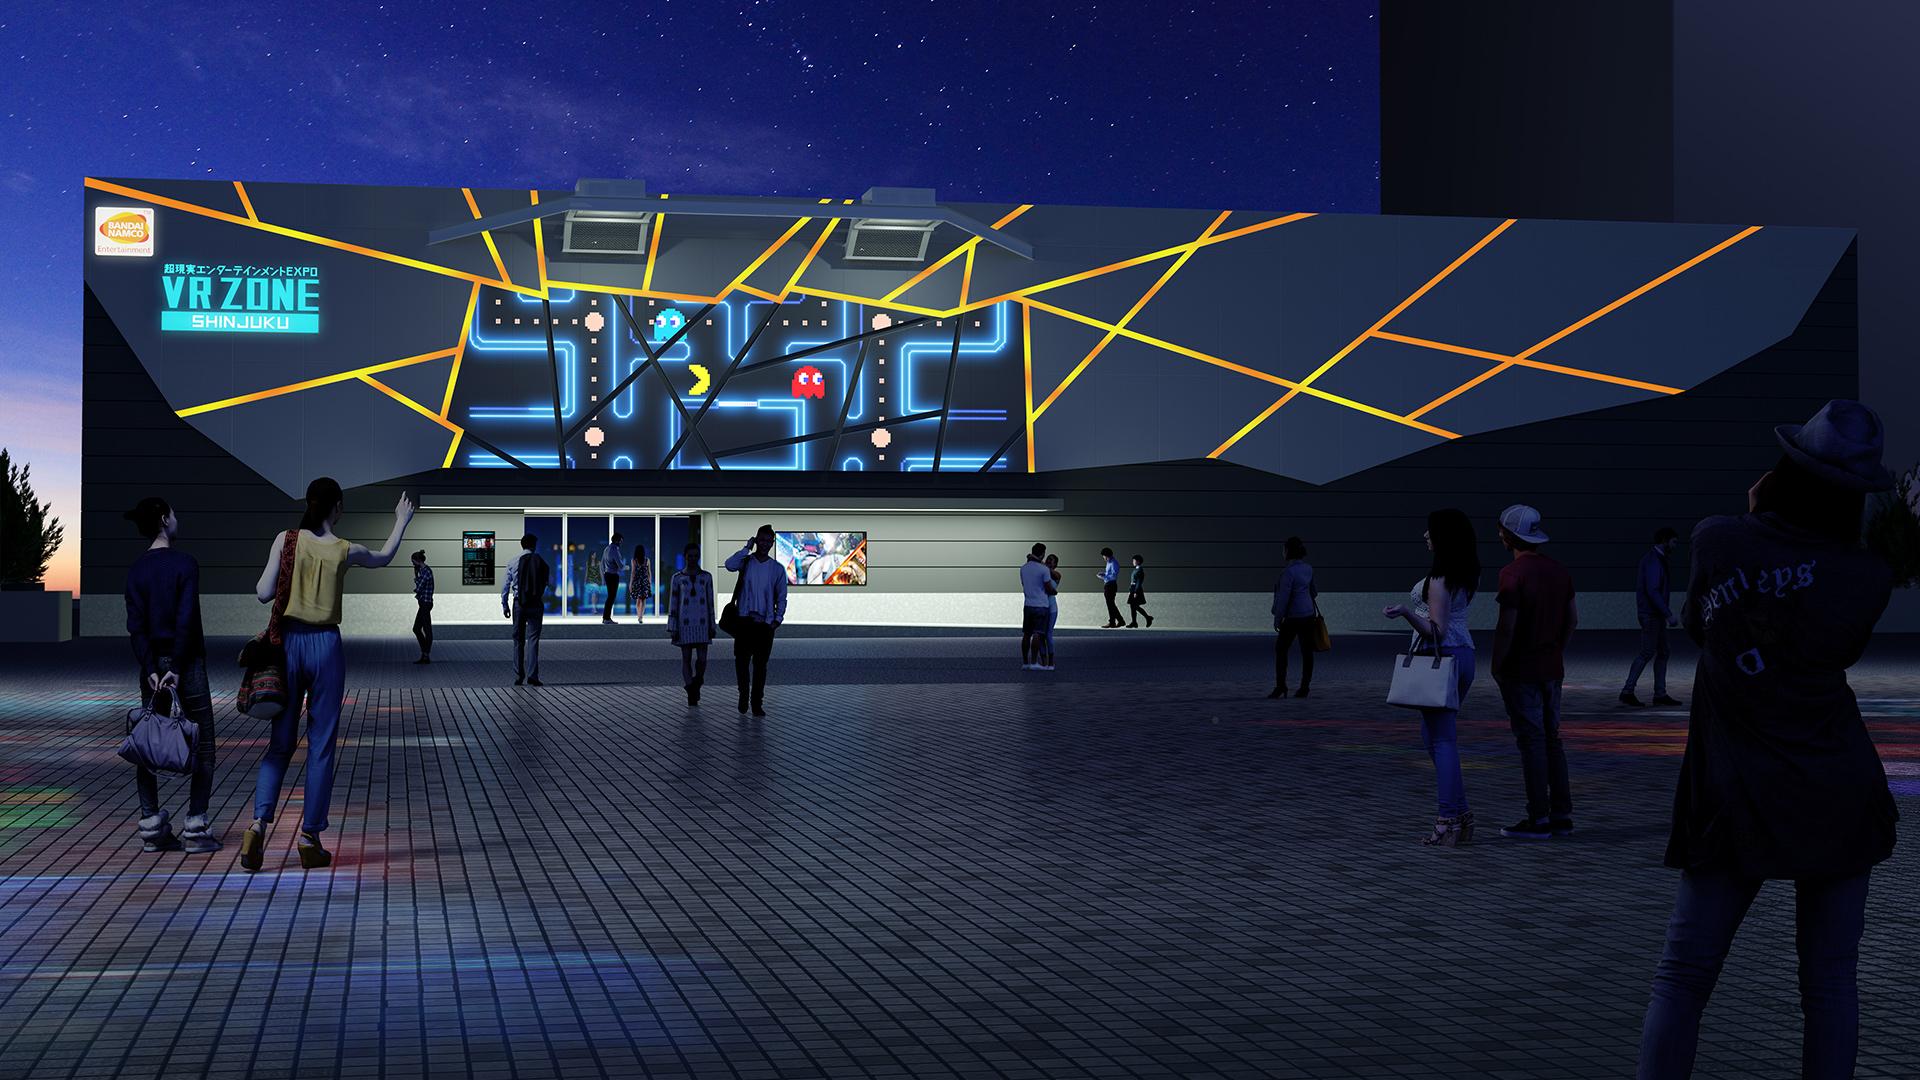 VR Zone Shinjuku Exterior Night